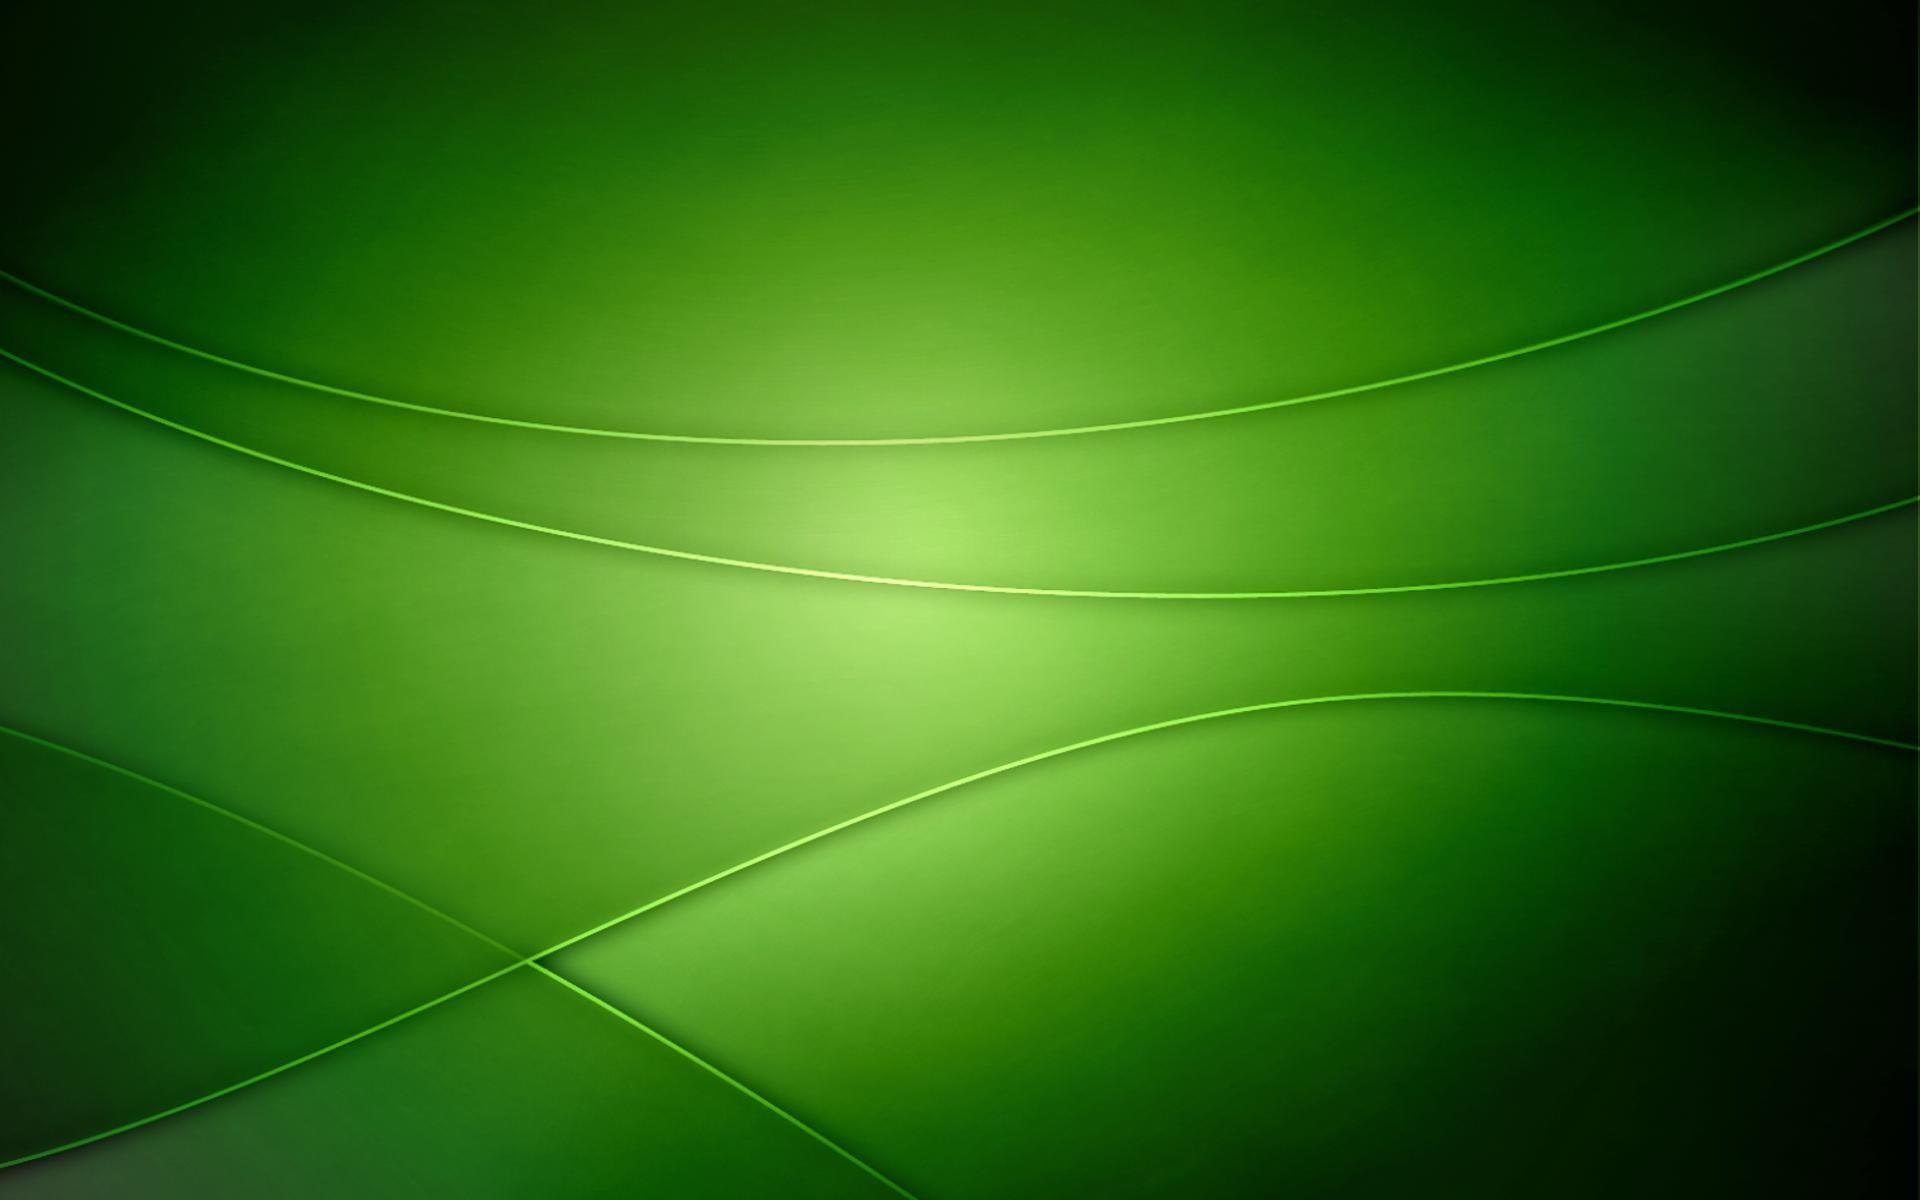 Green Technology Wallpapers - Wallpaper Cave